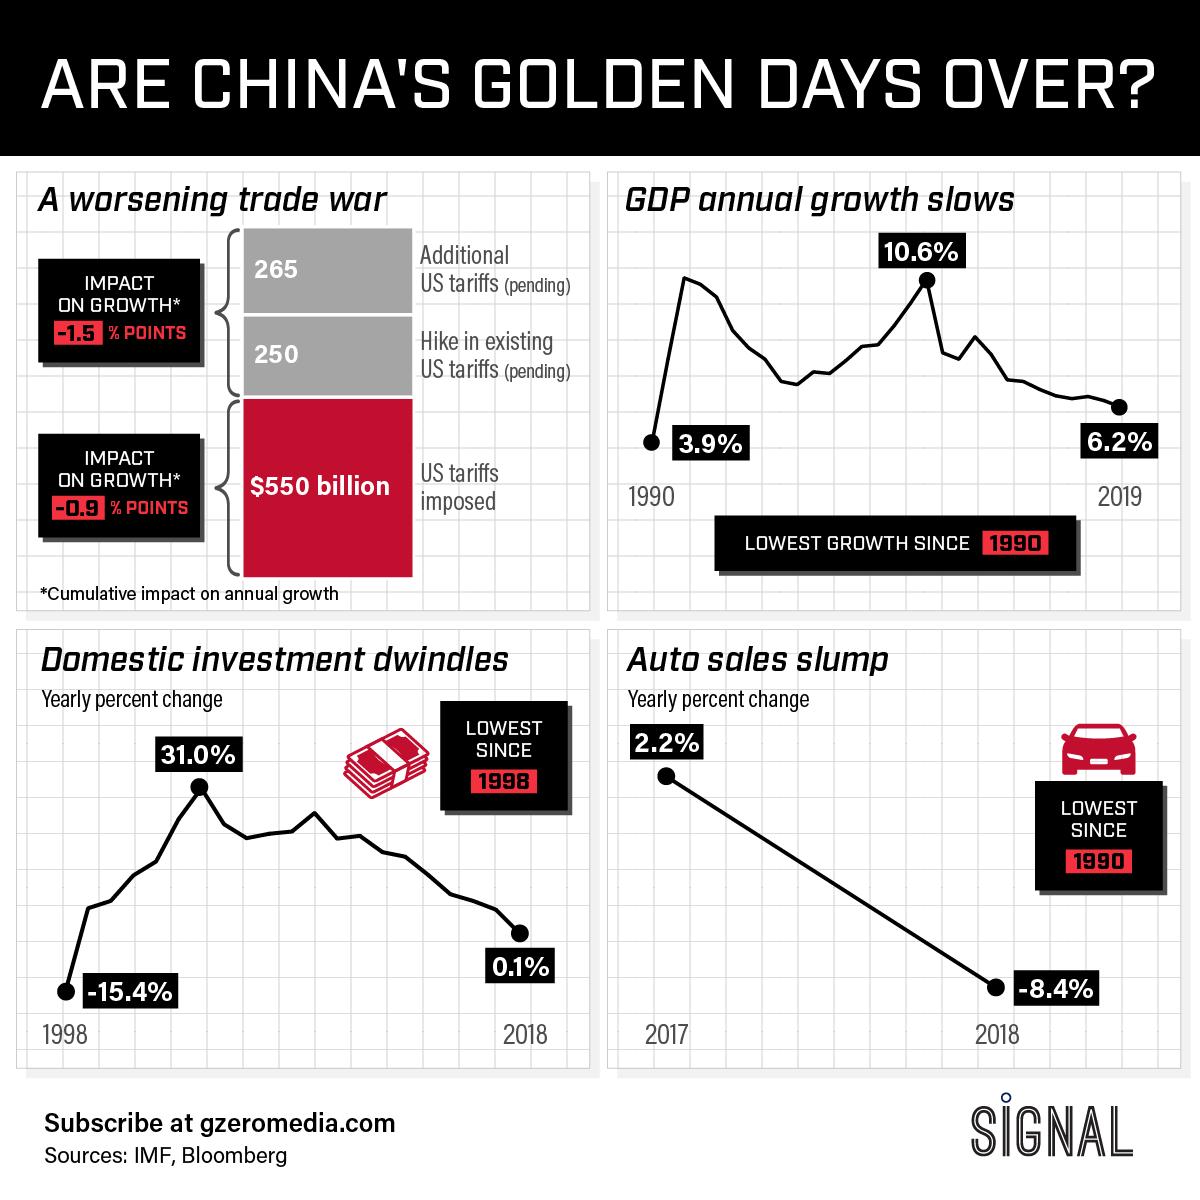 Graphic Truth: China's Battered Economy